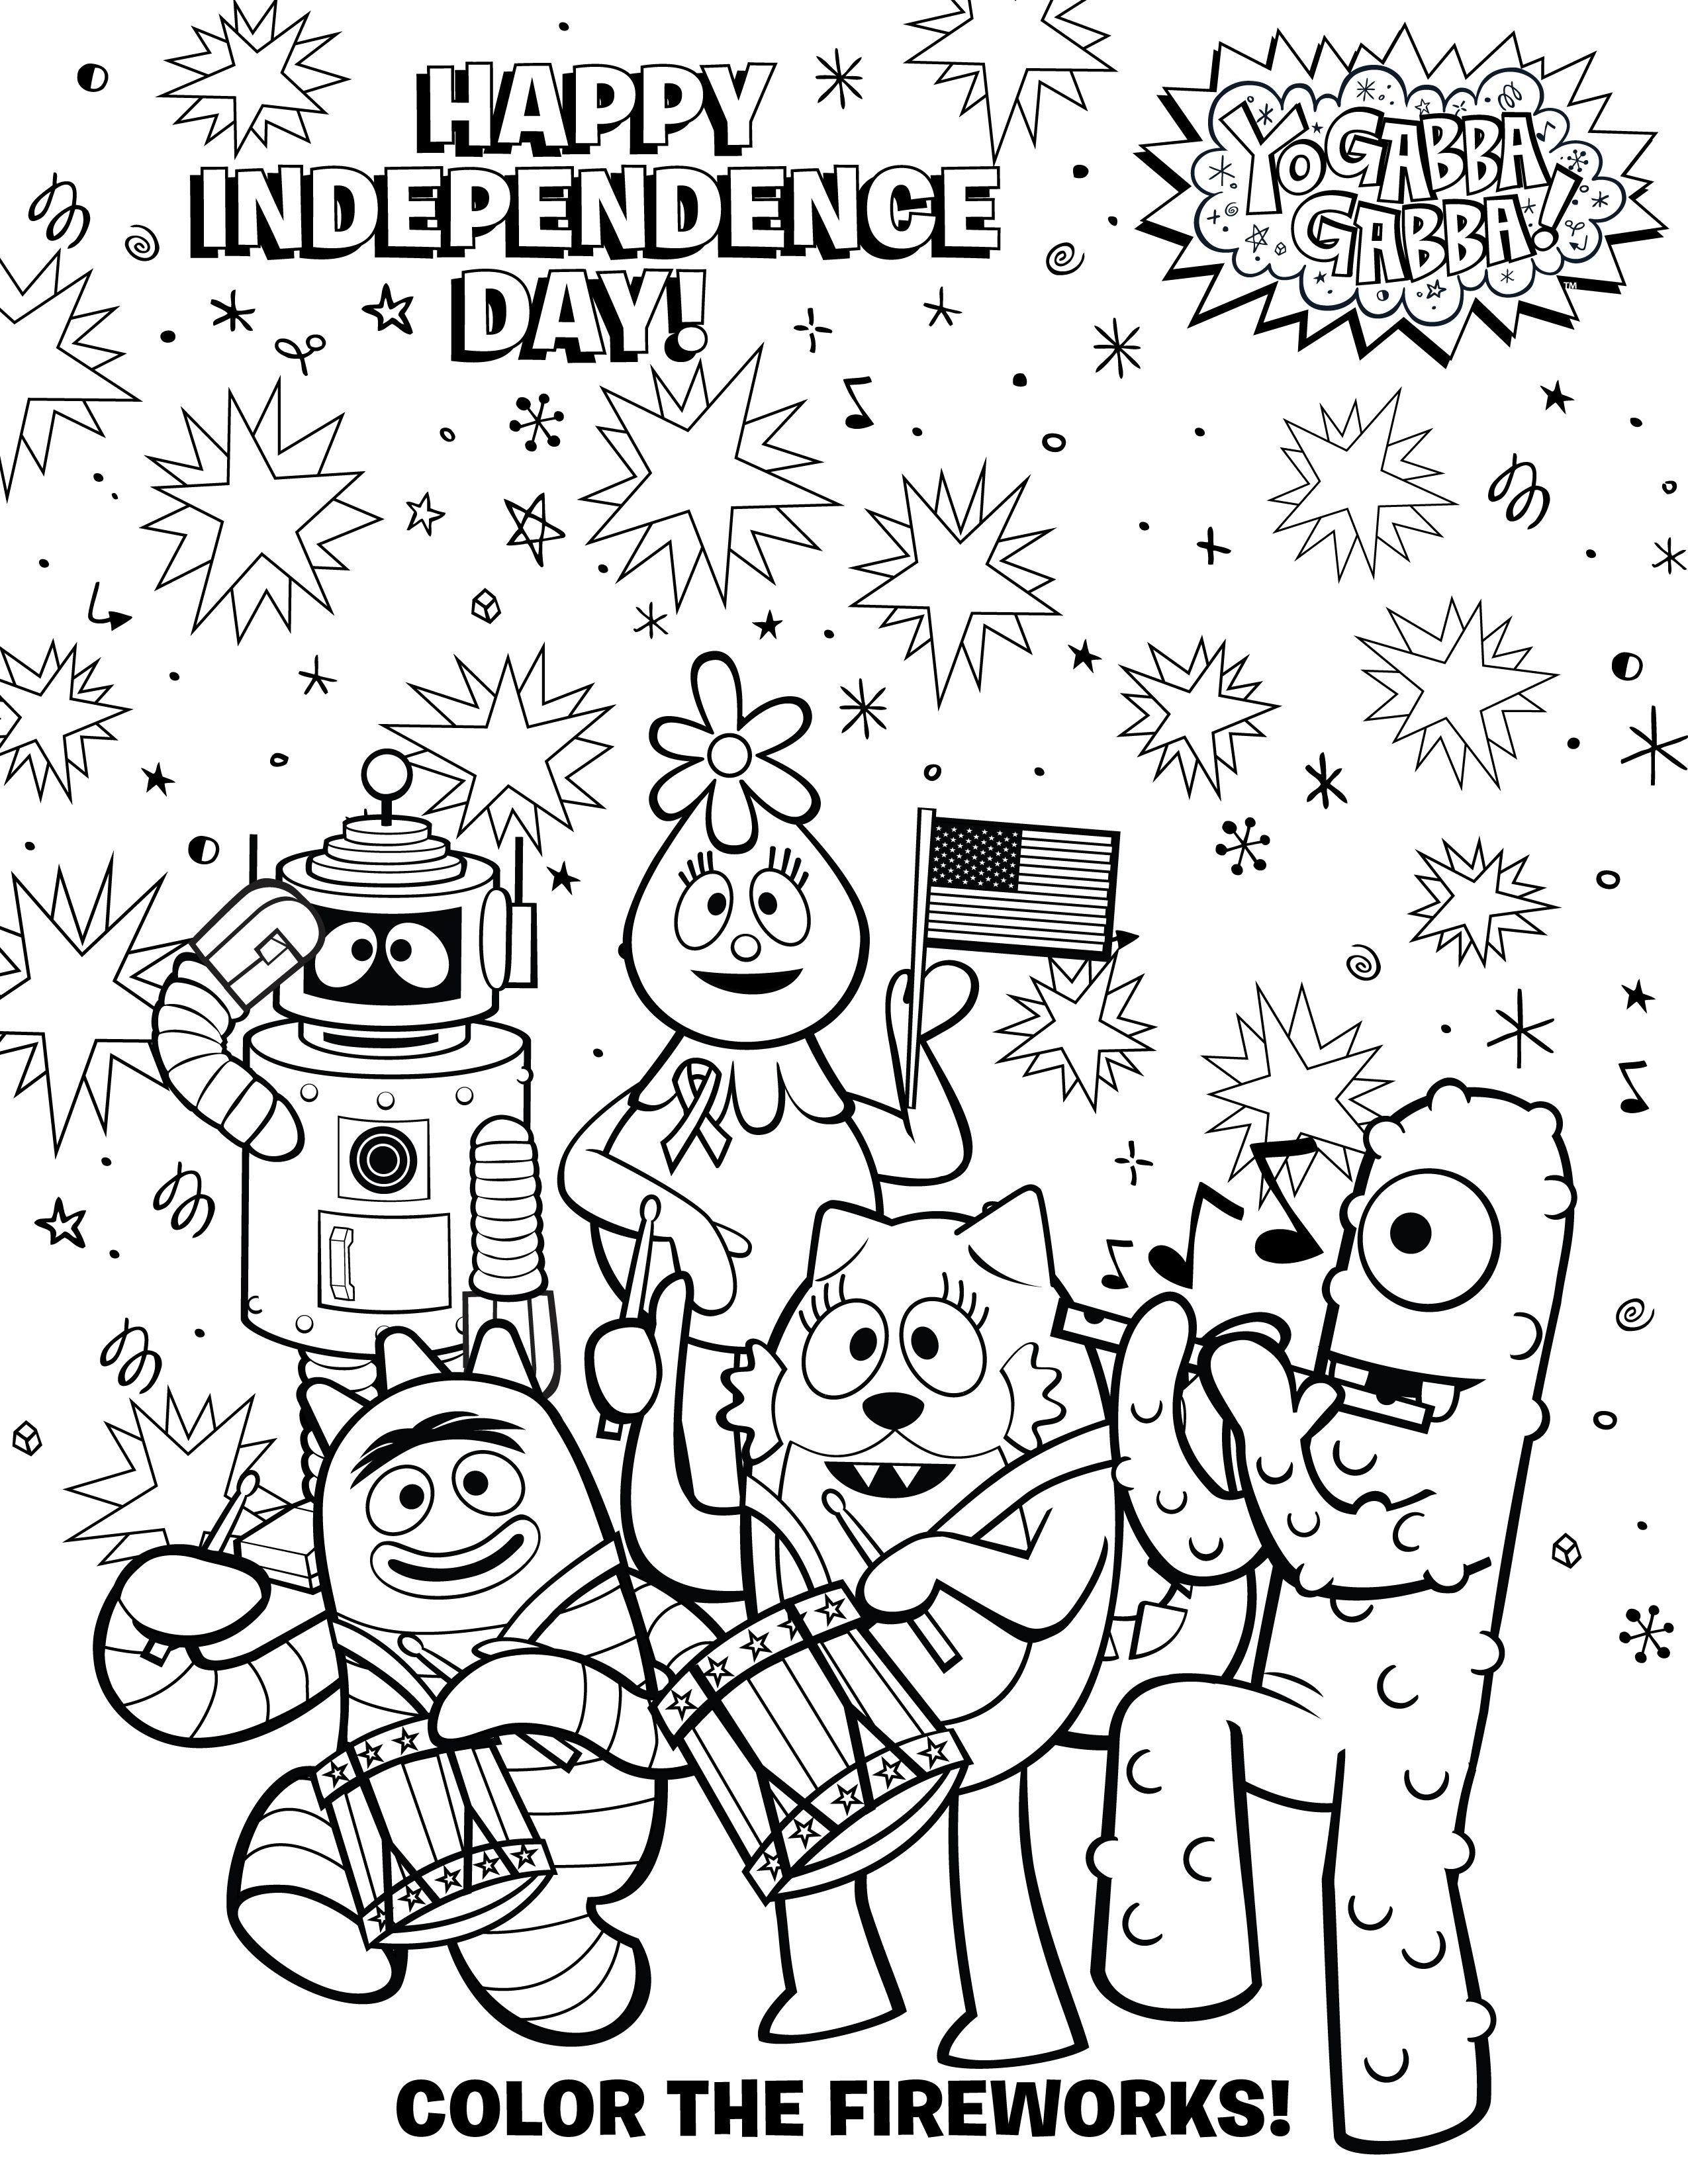 Enjoy This Free Ygg July4th Coloring Sheet